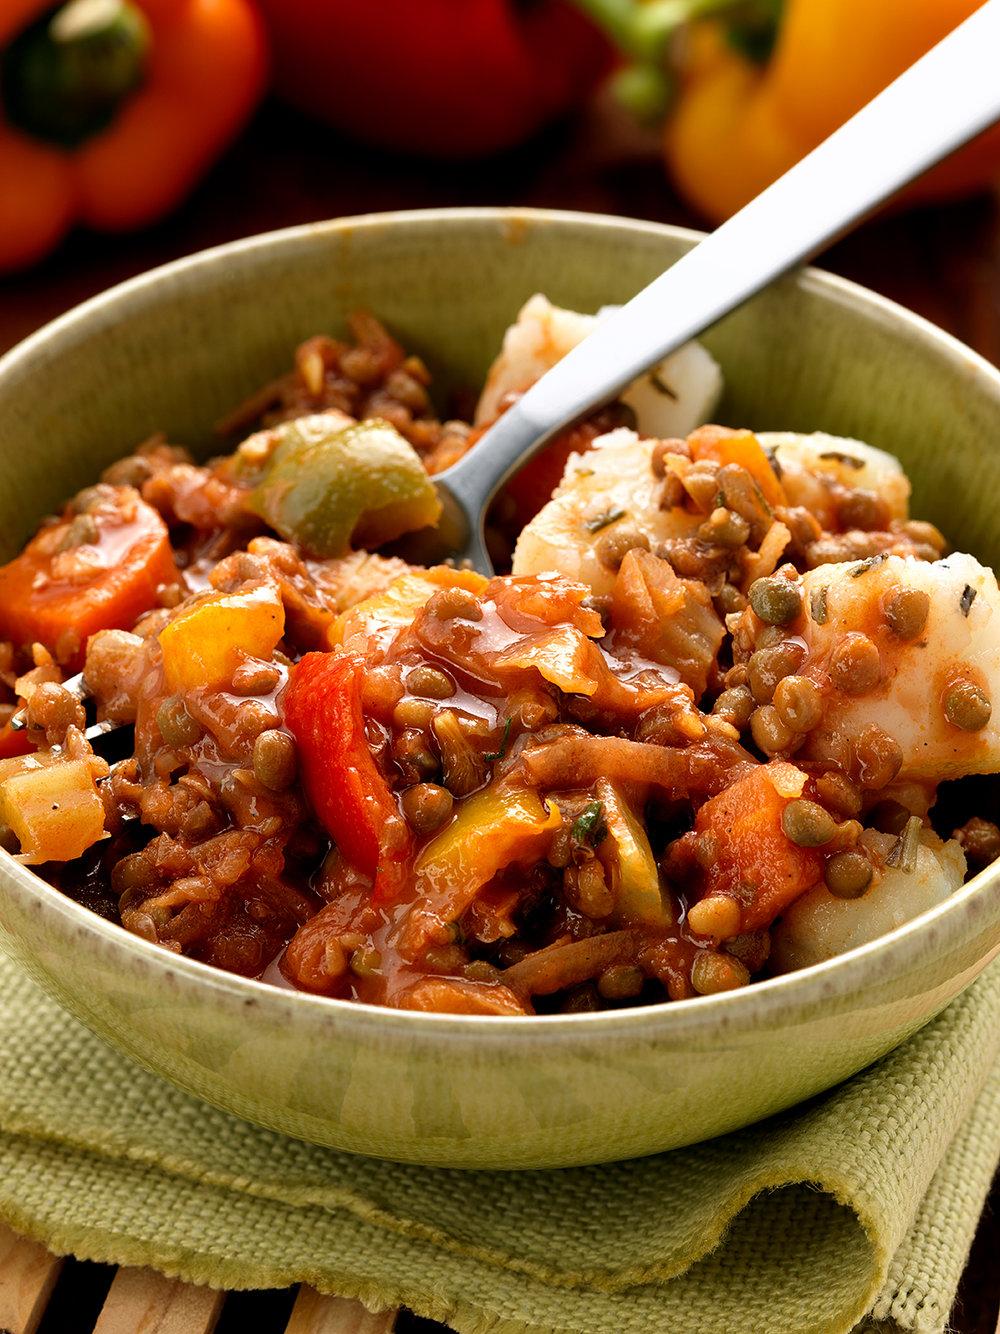 Vegan lentil dish